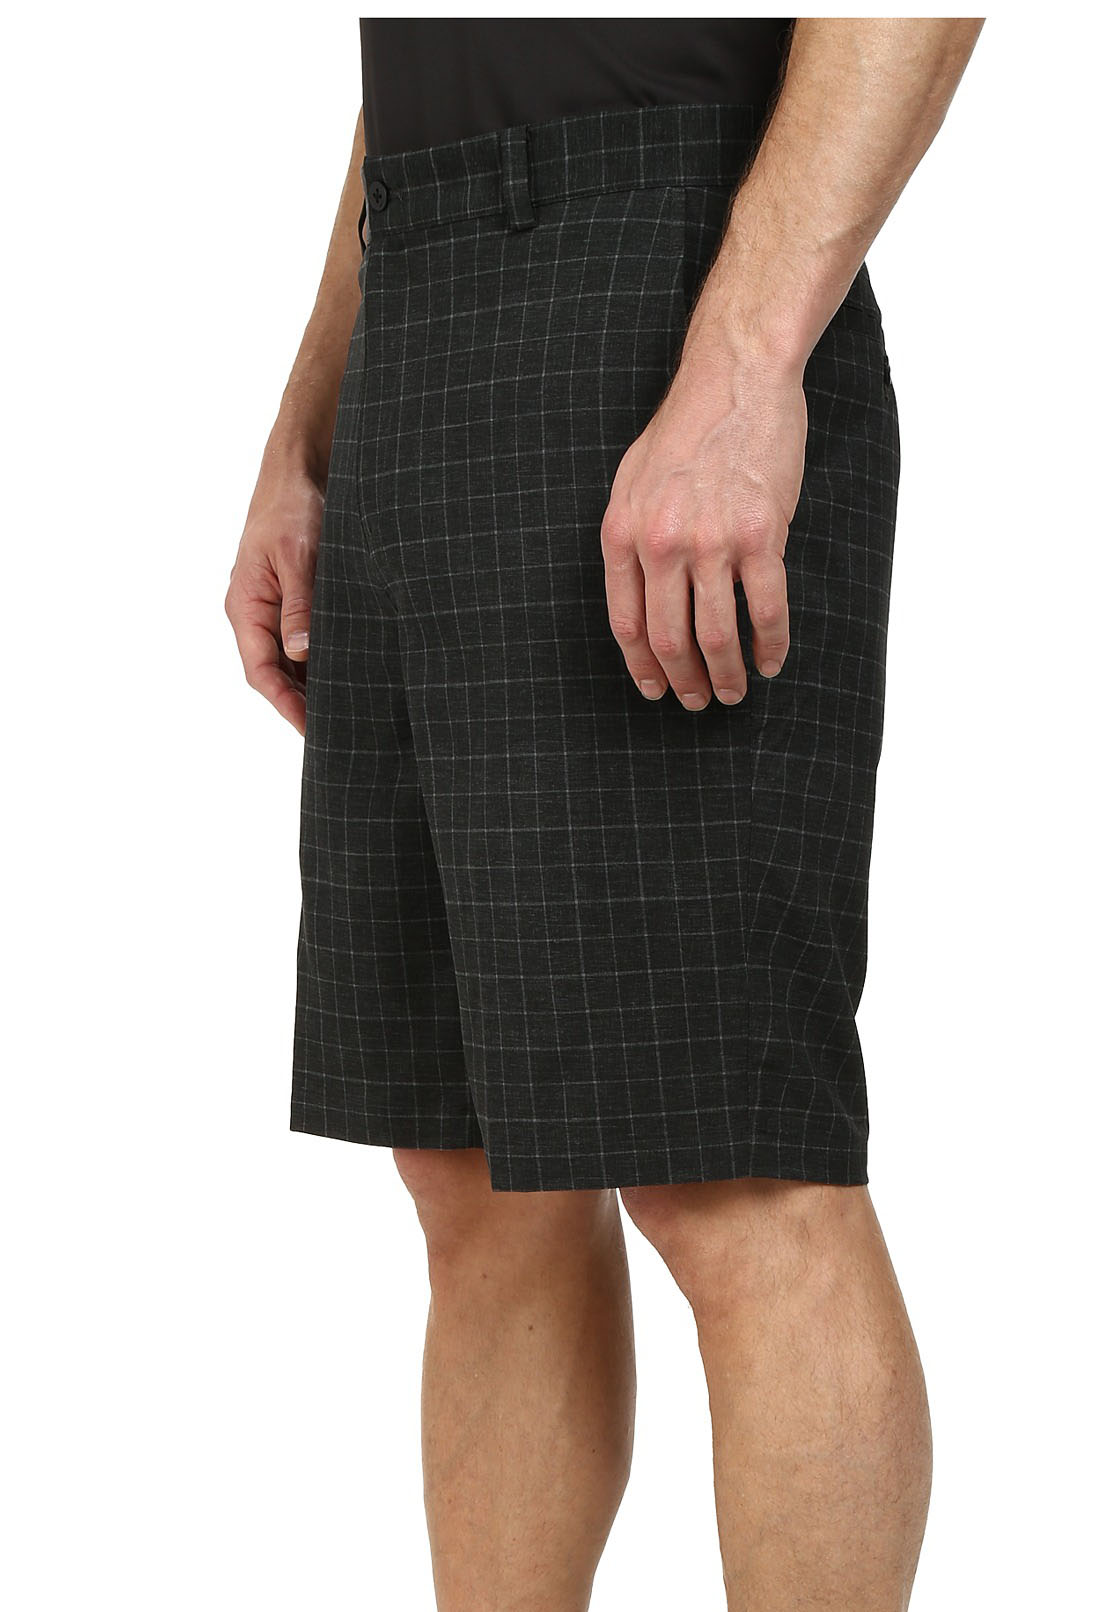 Nike Men's Dri-Fit Plaid Golf Shorts | eBay